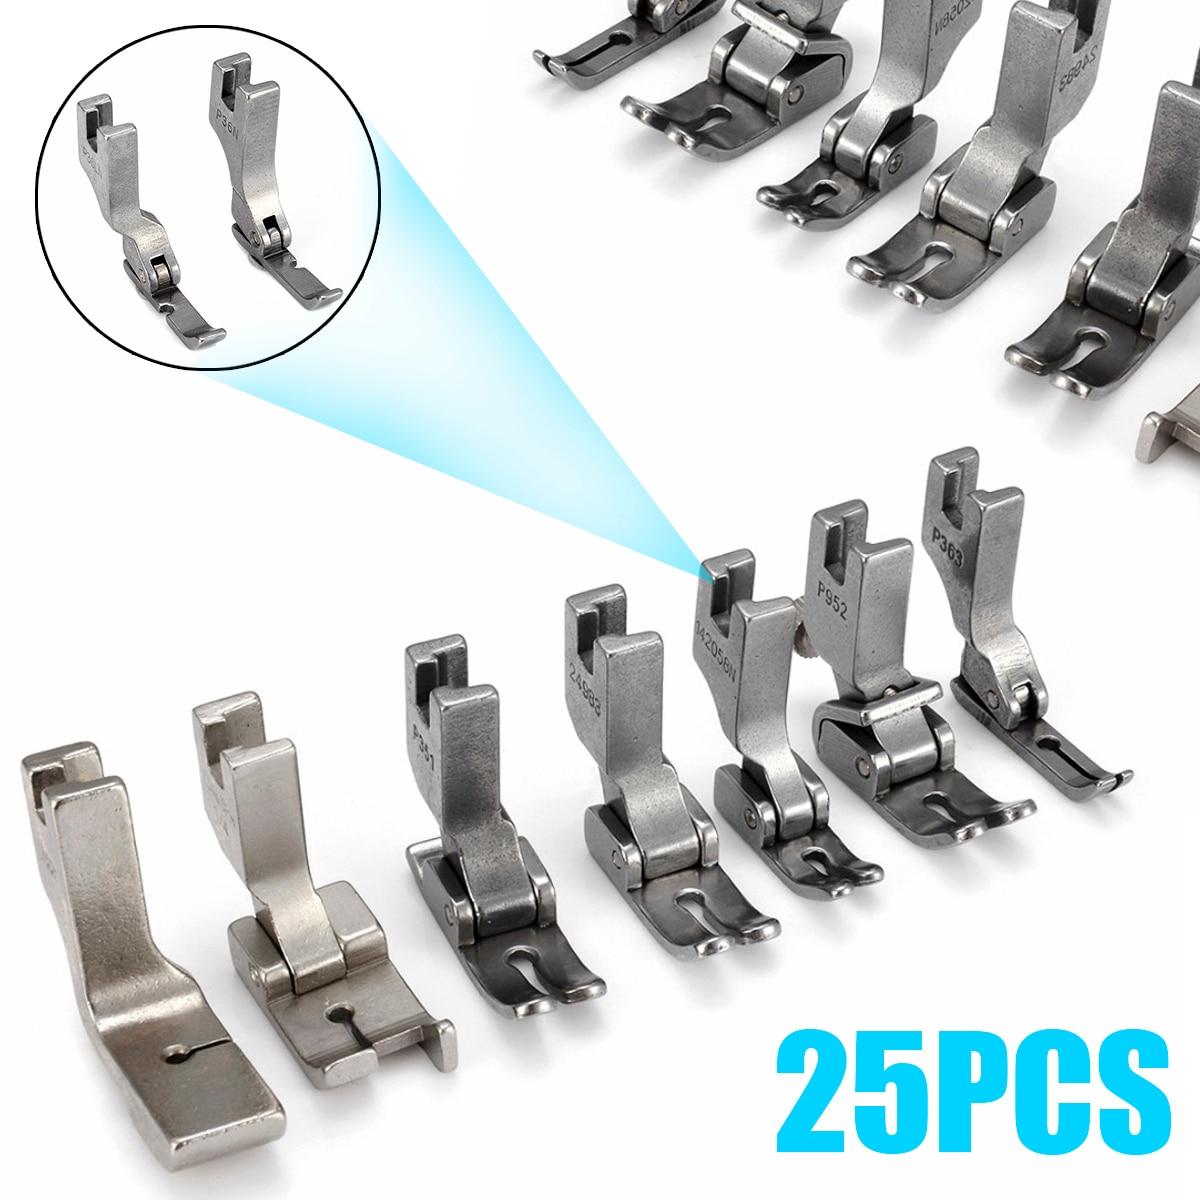 25 pçs de prata presser pé máquina de costura alta-haste presser pés conjunto diy para juki DDL-5550 8500 8700 máquina de costura industrial